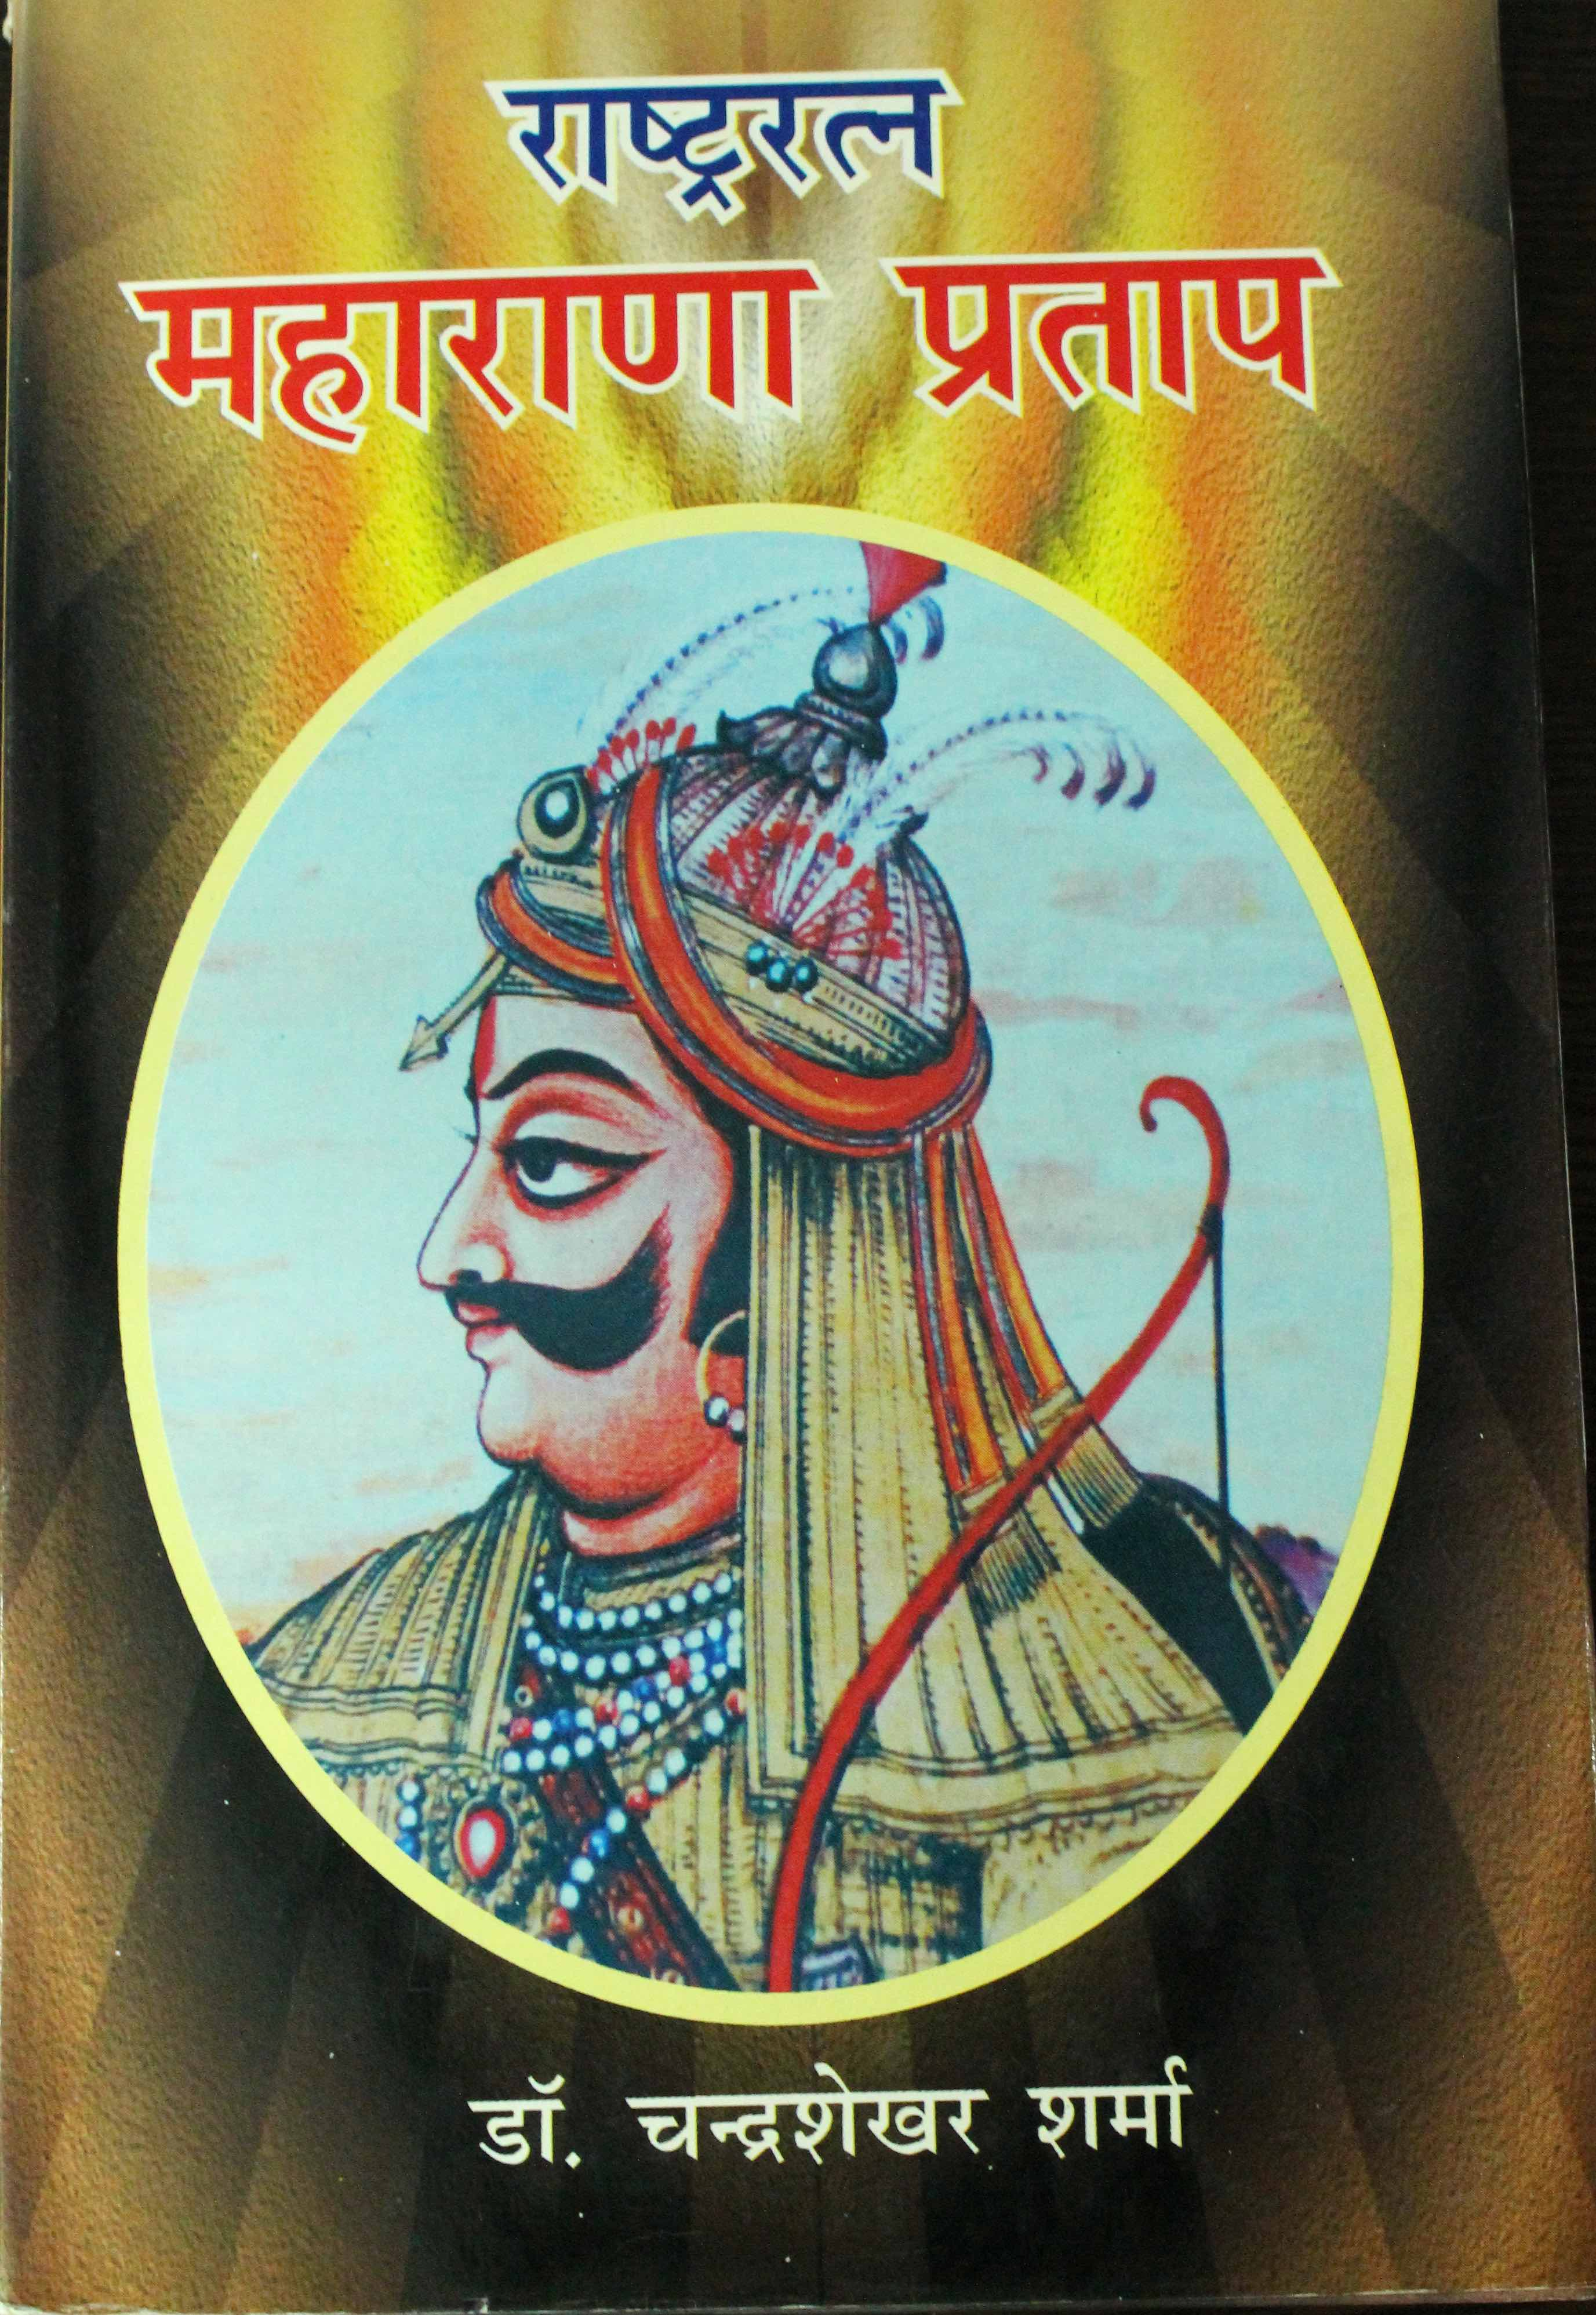 Cover of the book Rashtra Ratna Maharana Pratap. Credit: Shruti Jain